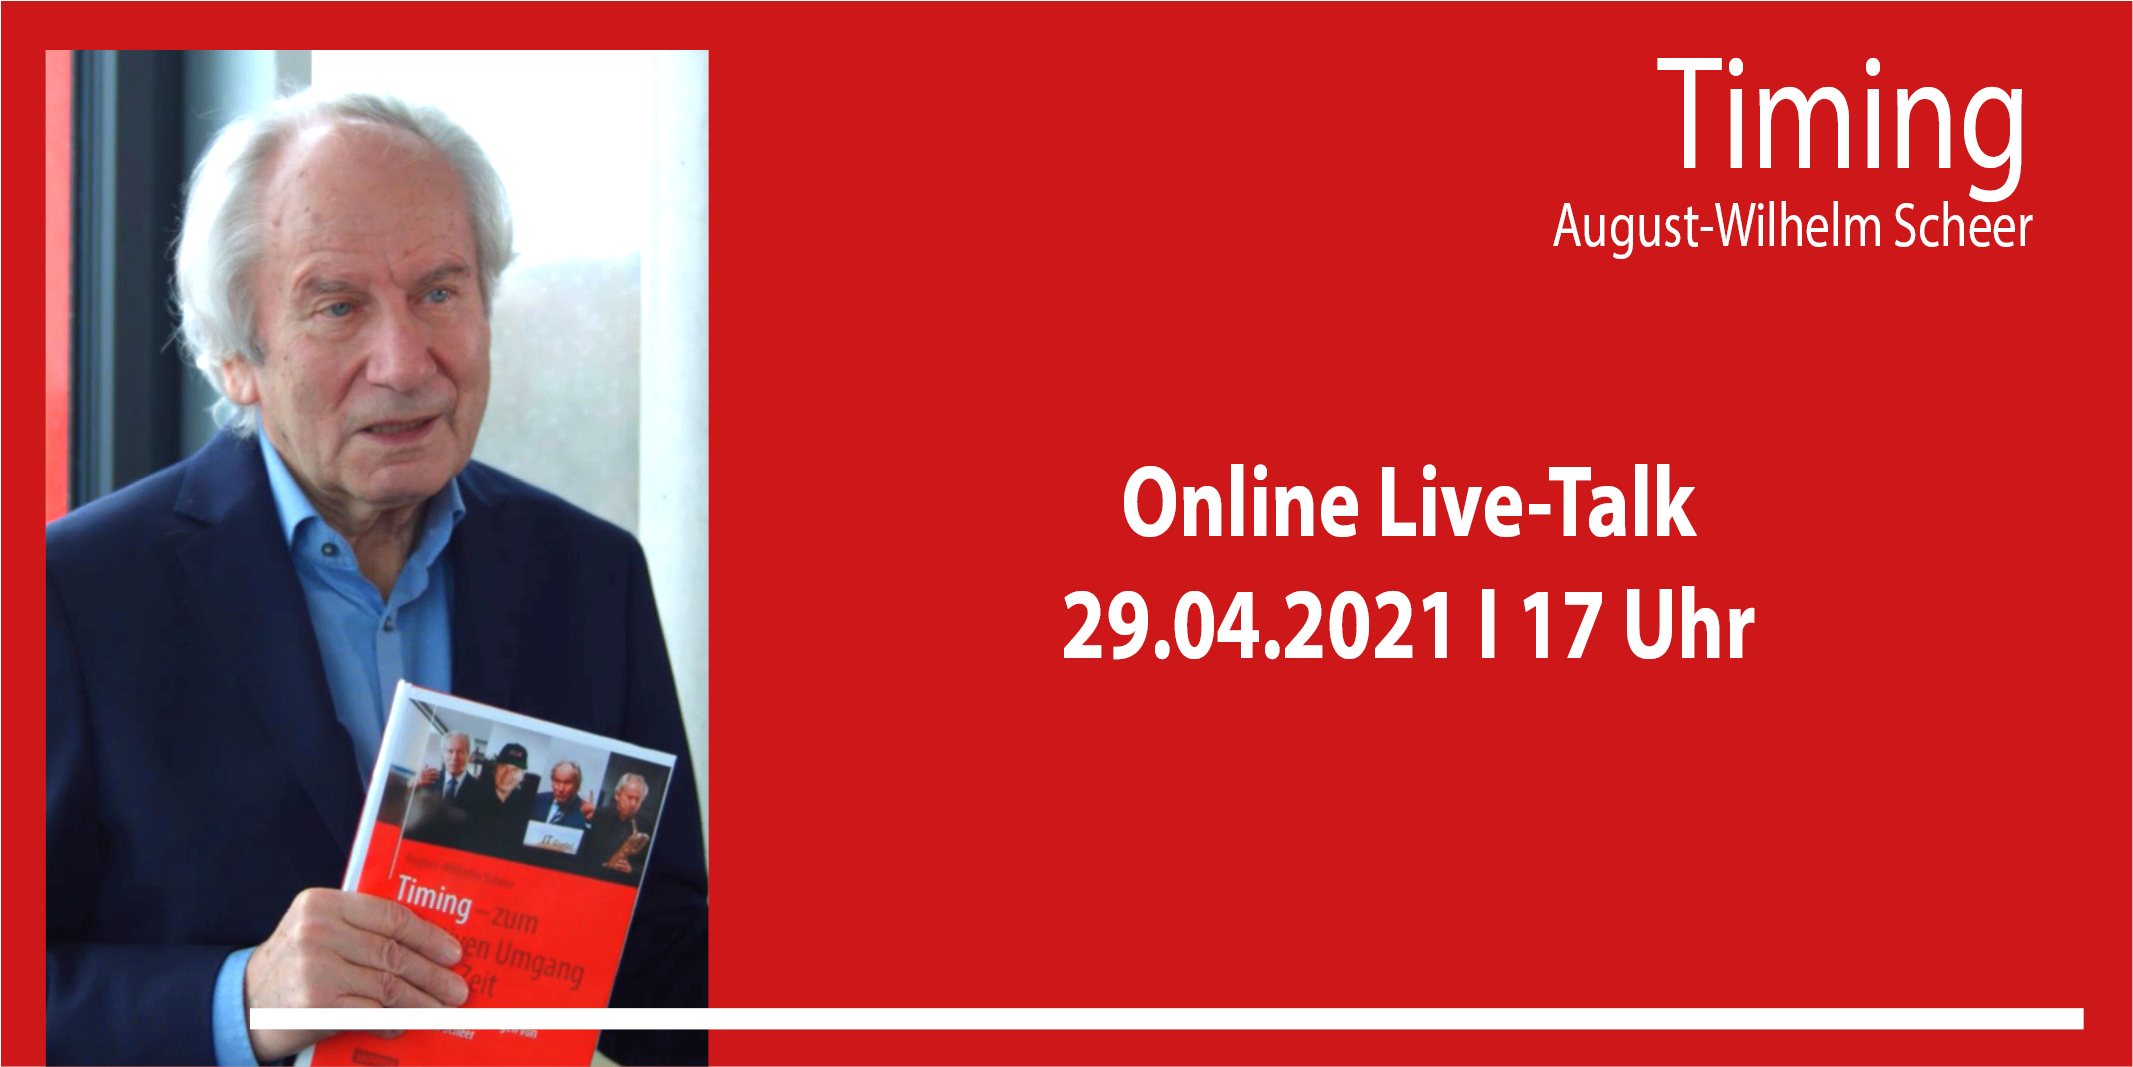 Open Live-Talk Prof. Scheer